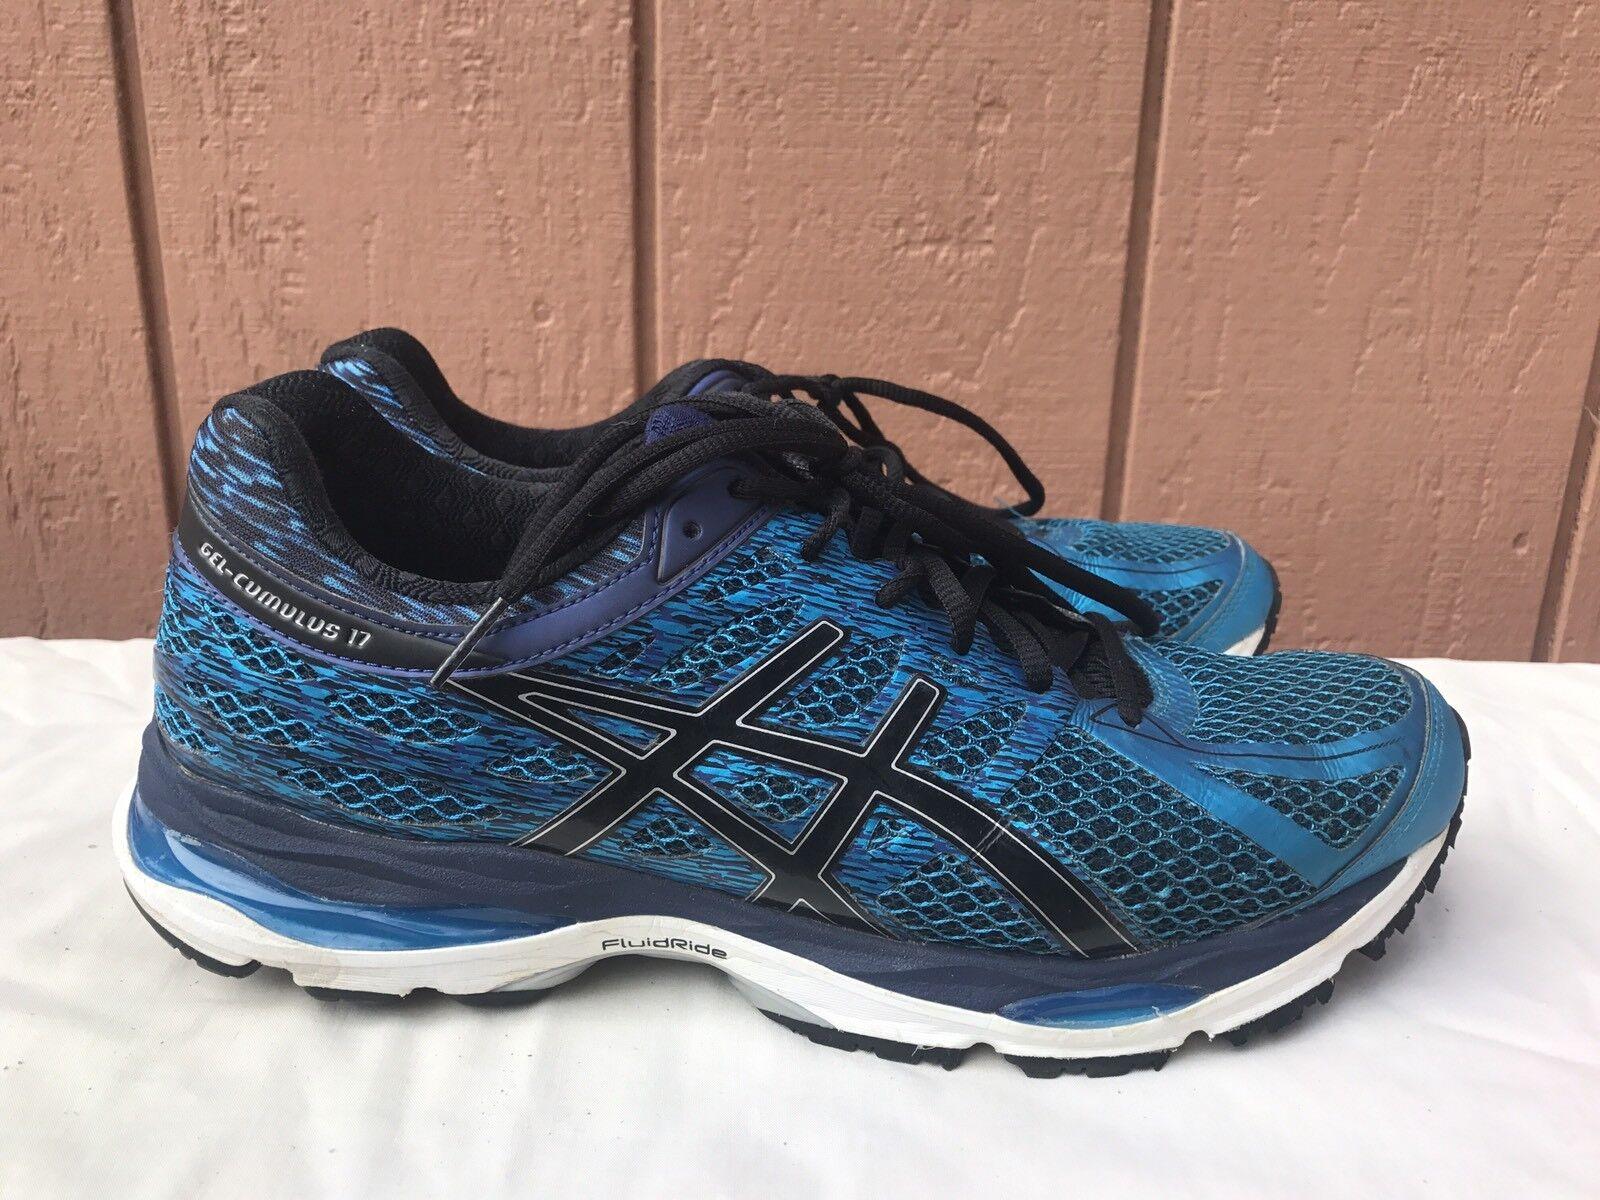 Asics Gel Cumulus 17 Island Blue/Black Men's US 9.5 Running Shoes T5D3N